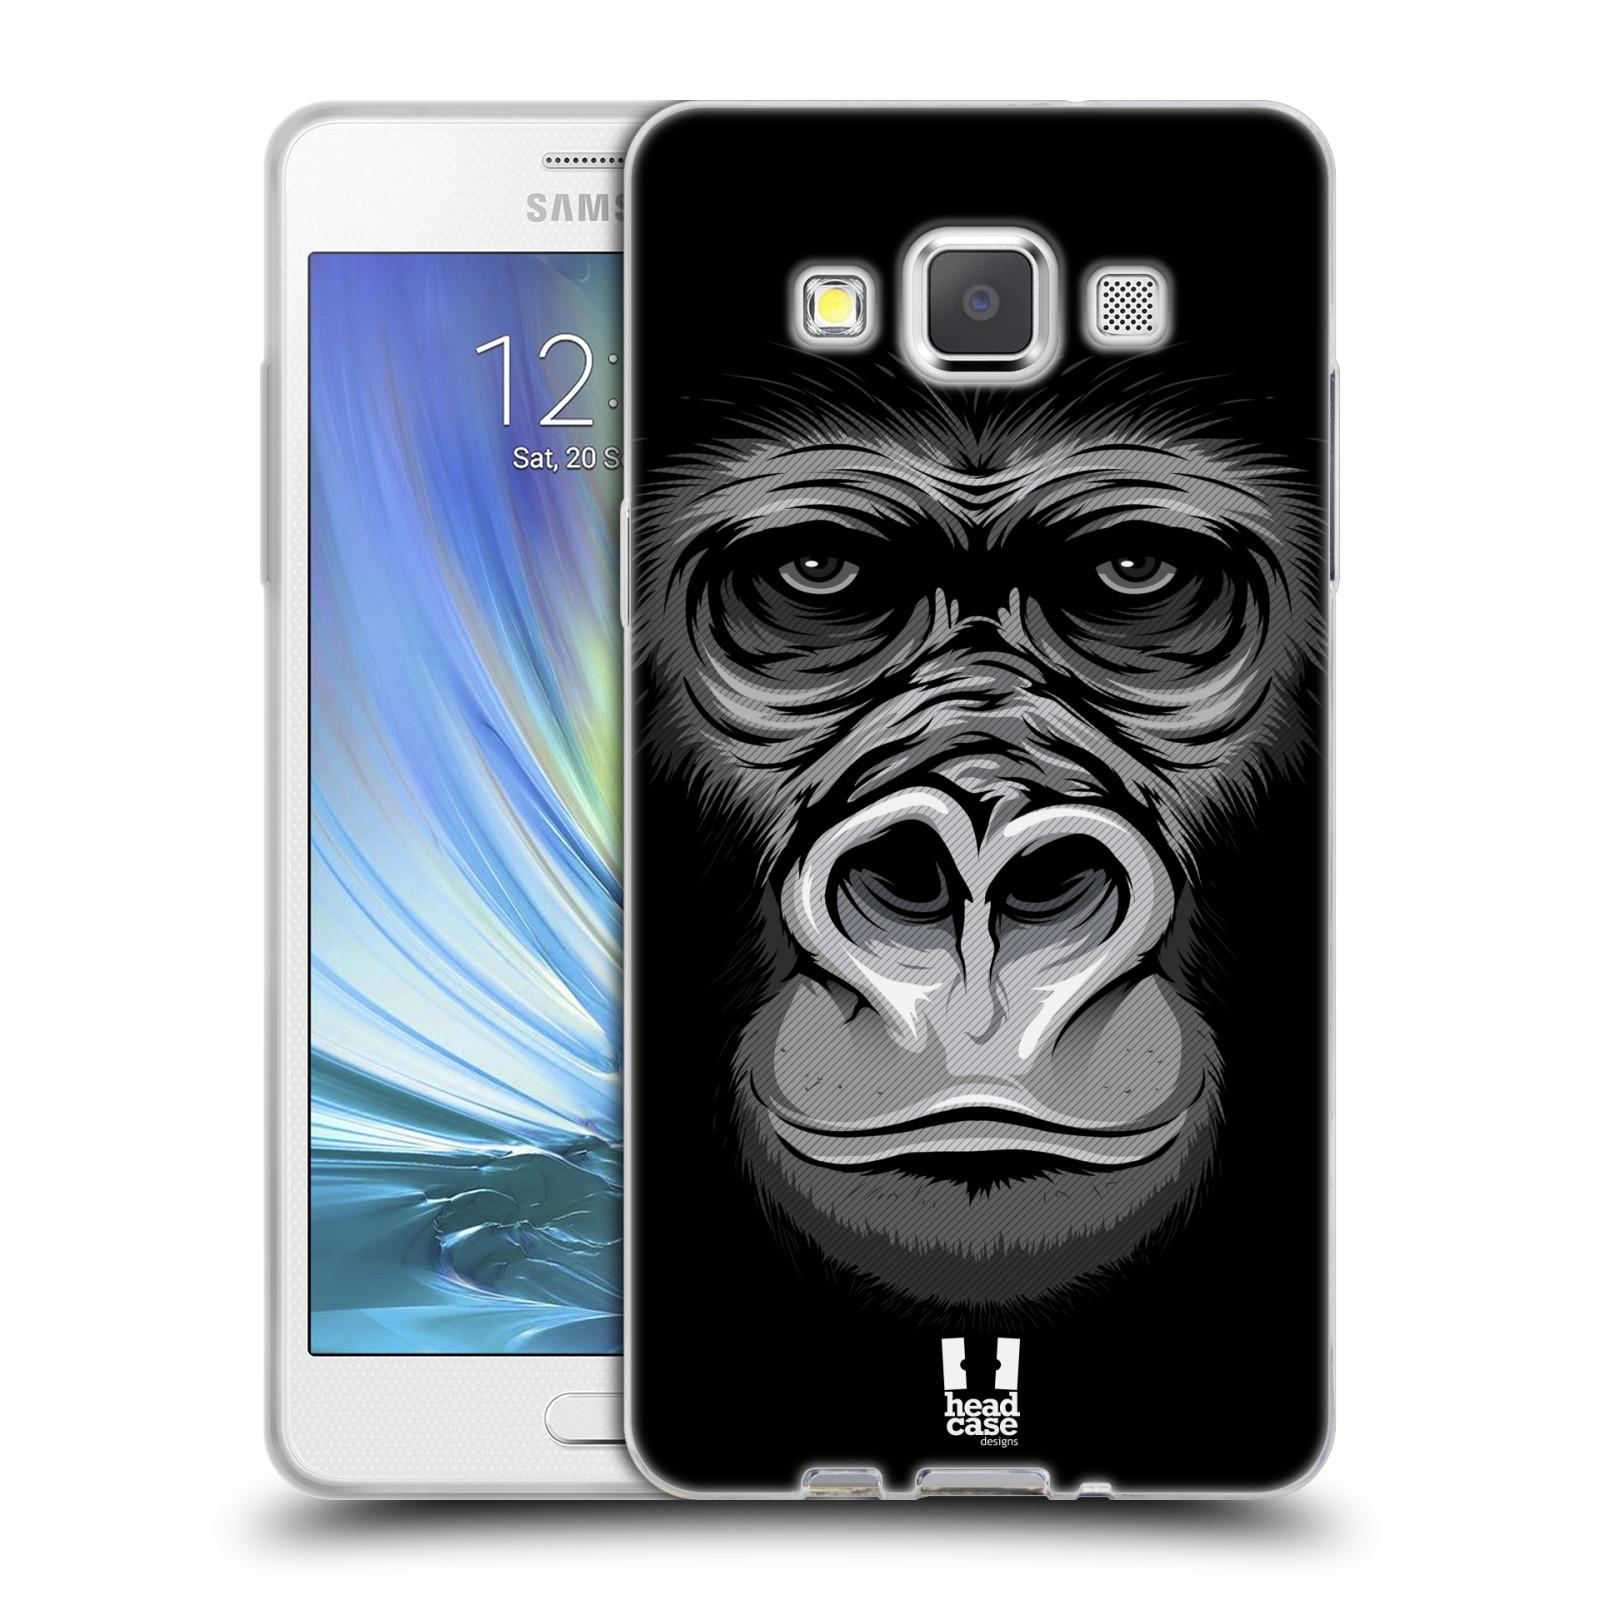 HEAD CASE silikonový obal na mobil Samsung Galaxy A5 vzor Zvíře kreslená tvář 2 gorila